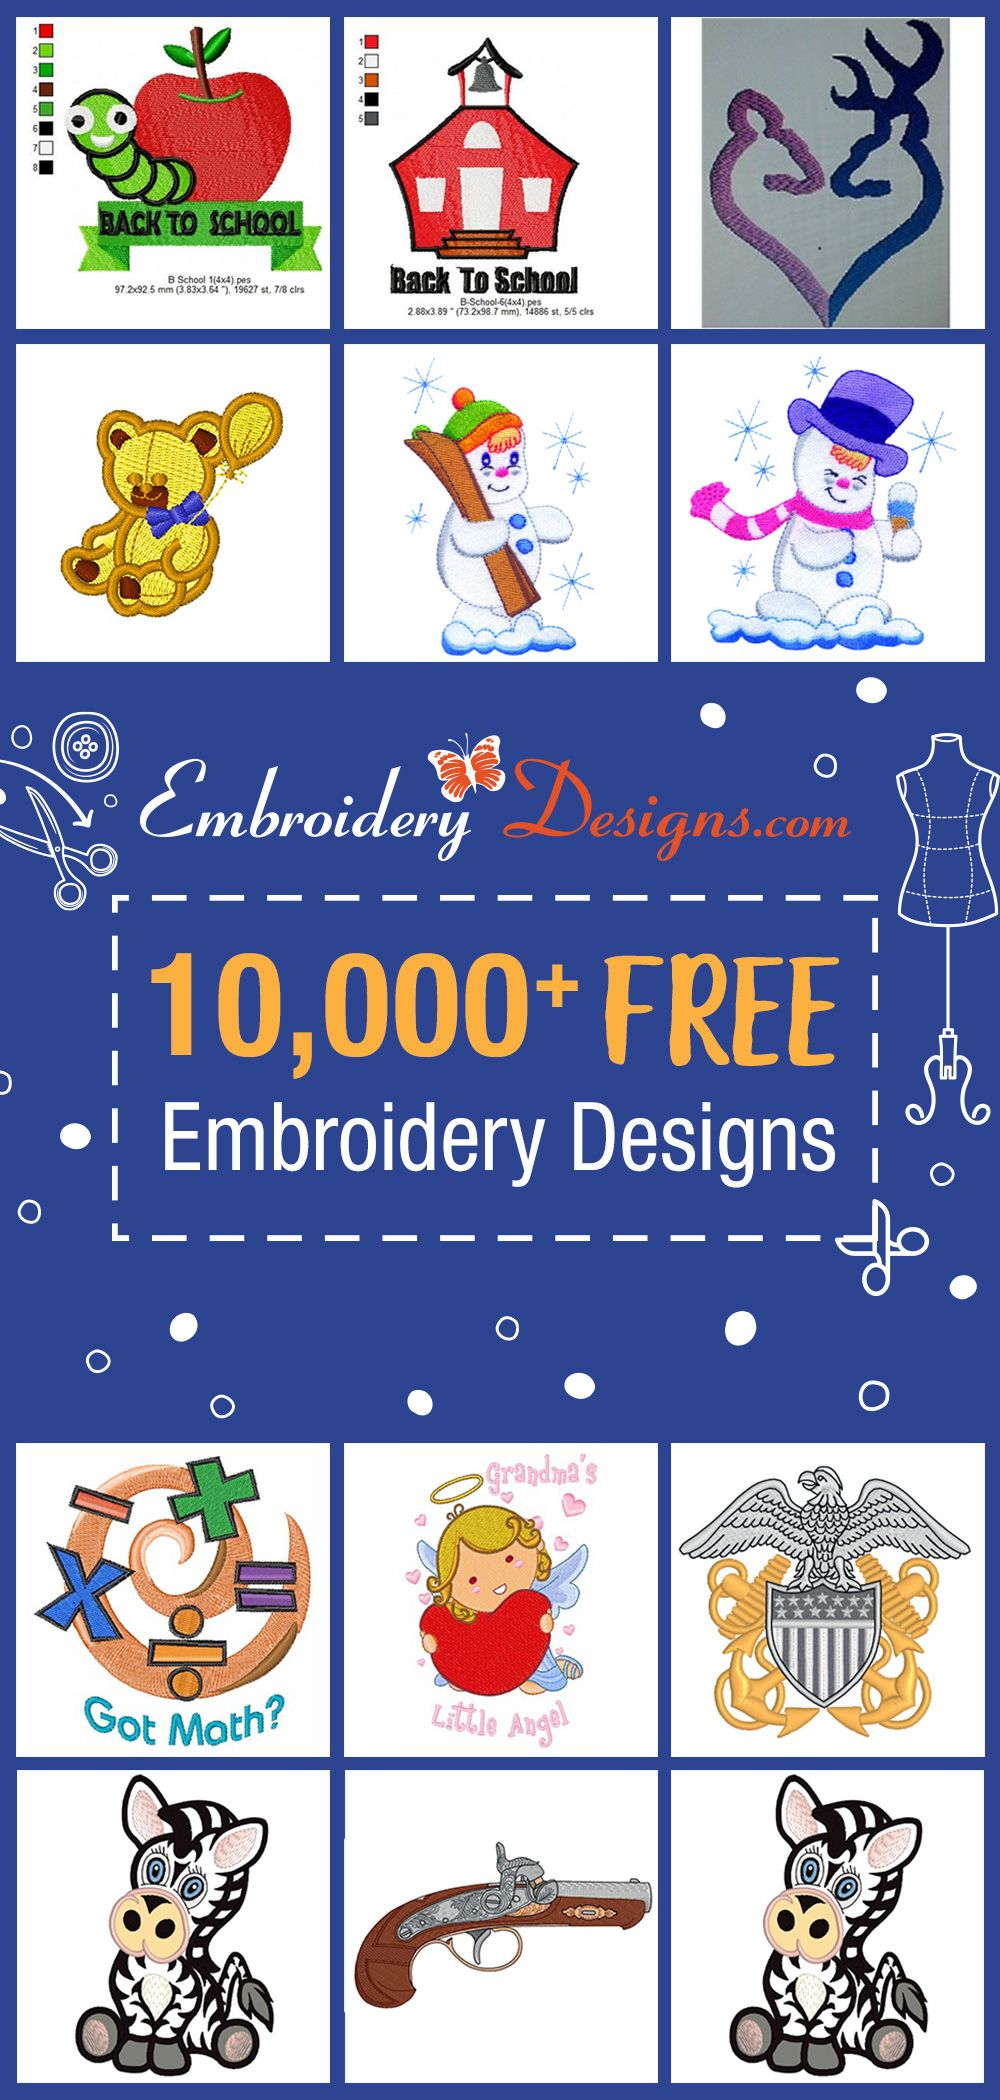 Free Machine Embroidery Designs in 2020 | Free machine ...